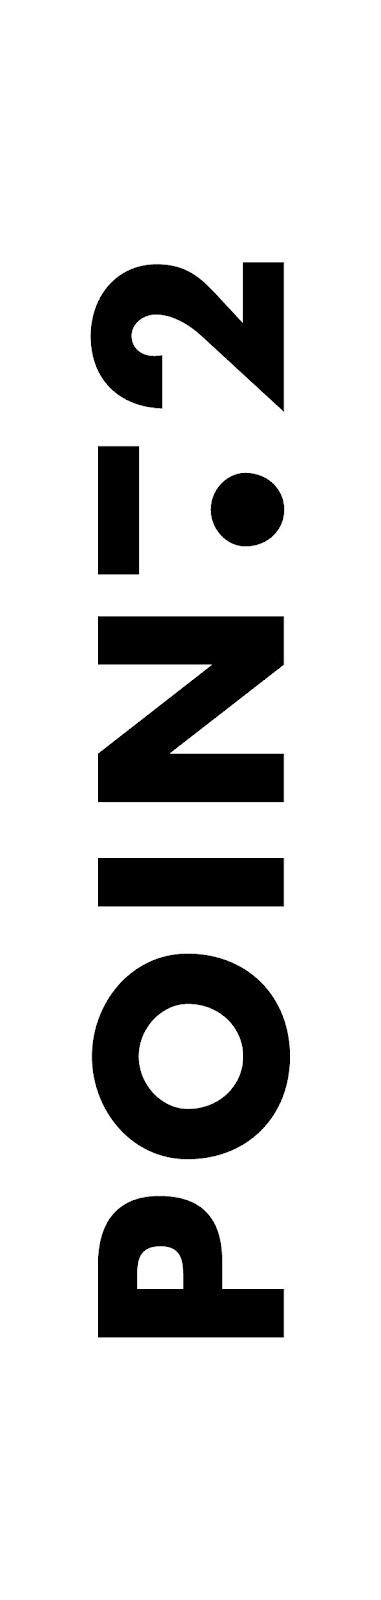 http://1.bp.blogspot.com/-GWEkdNGlP_0/T5z3t6DE50I/AAAAAAAADGw/jVAvp0dKL04/s1600/nouveau+logo+.2.jpg